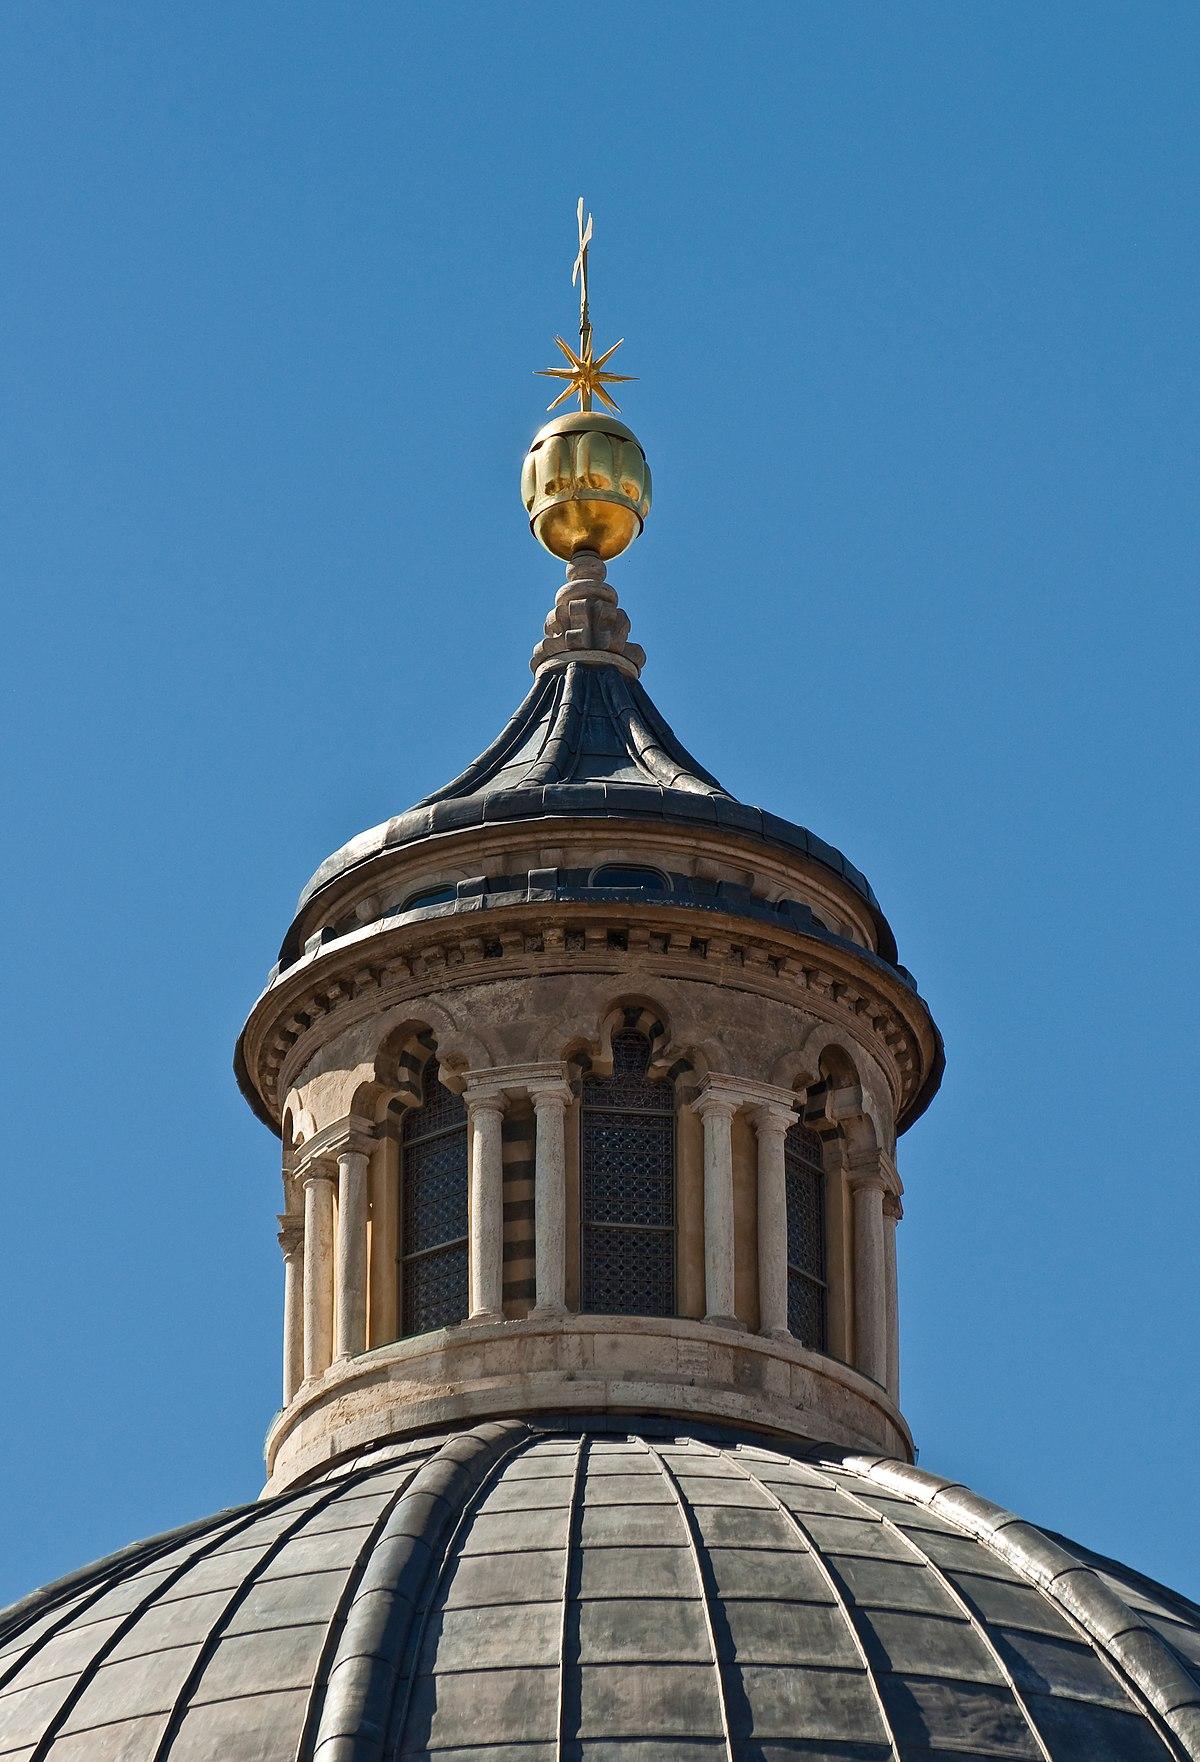 File:Duomo di Siena Campanile top.JPG - Wikipedia